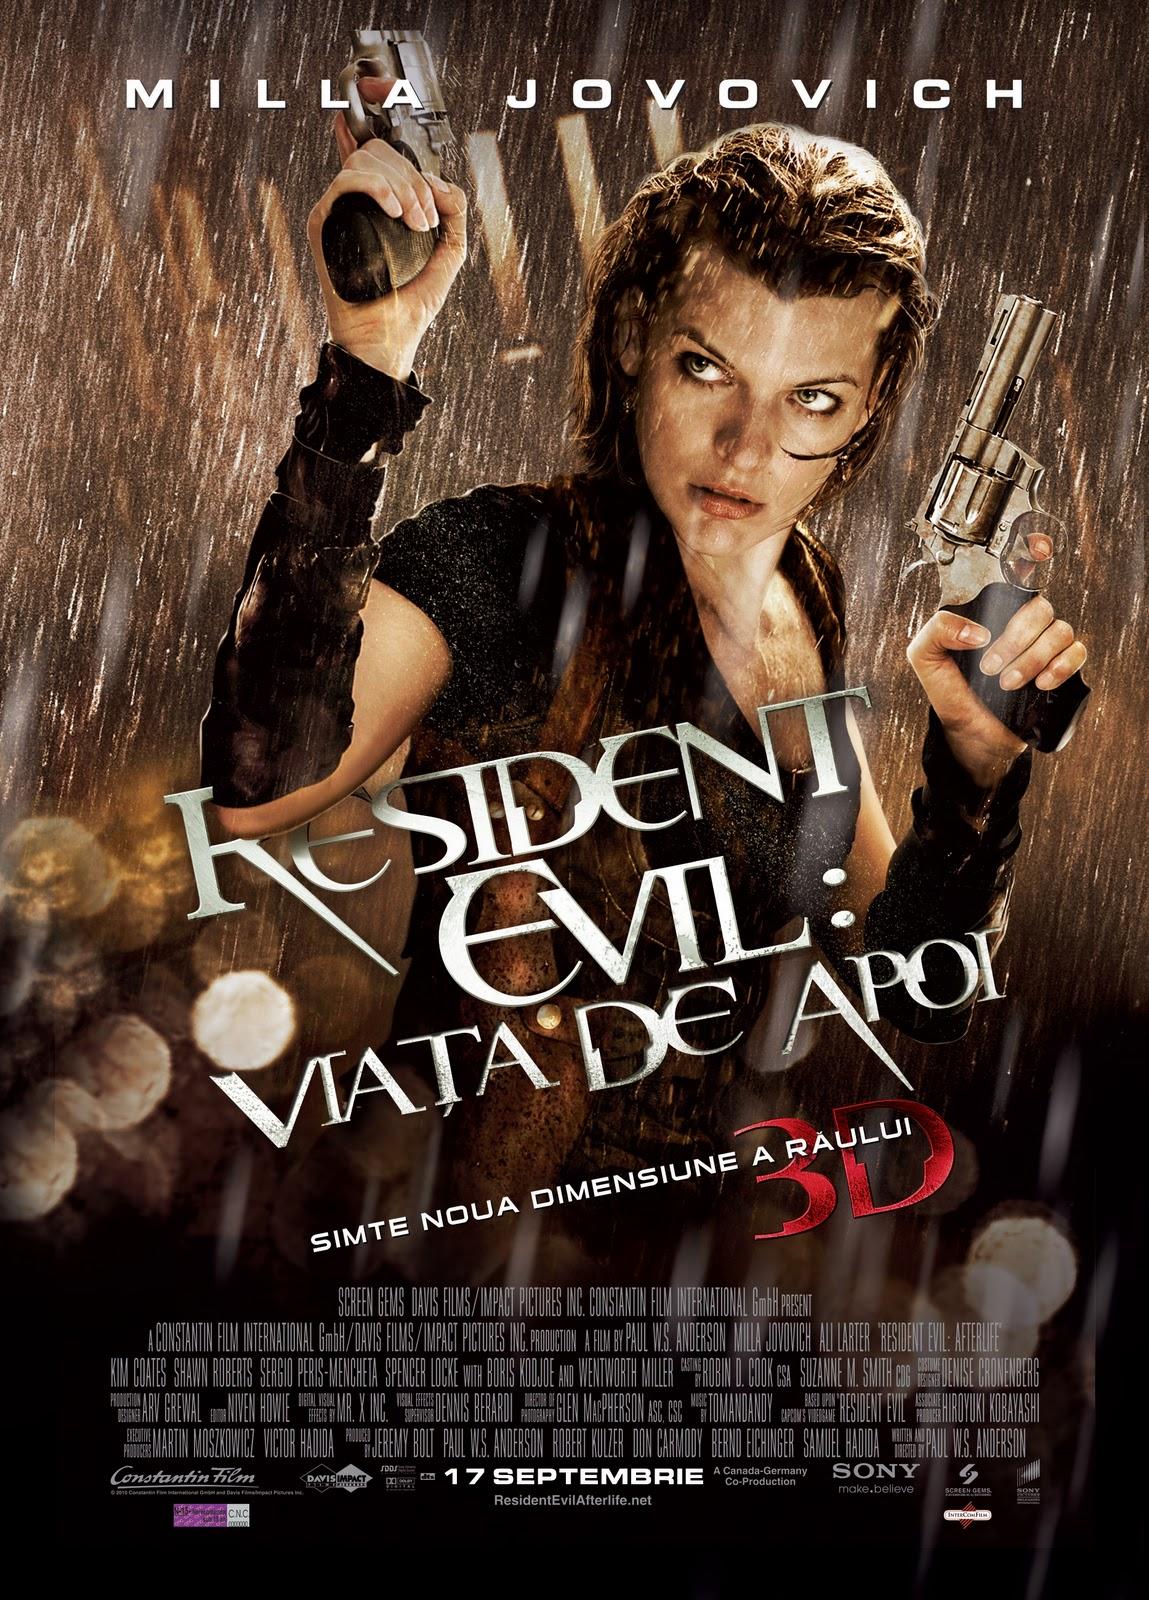 http://3.bp.blogspot.com/__lpiOSEBlko/TLiyjPmyIiI/AAAAAAAADuc/XaLJVzzin0c/s1600/resident-evil-afterlife-728904l.jpg